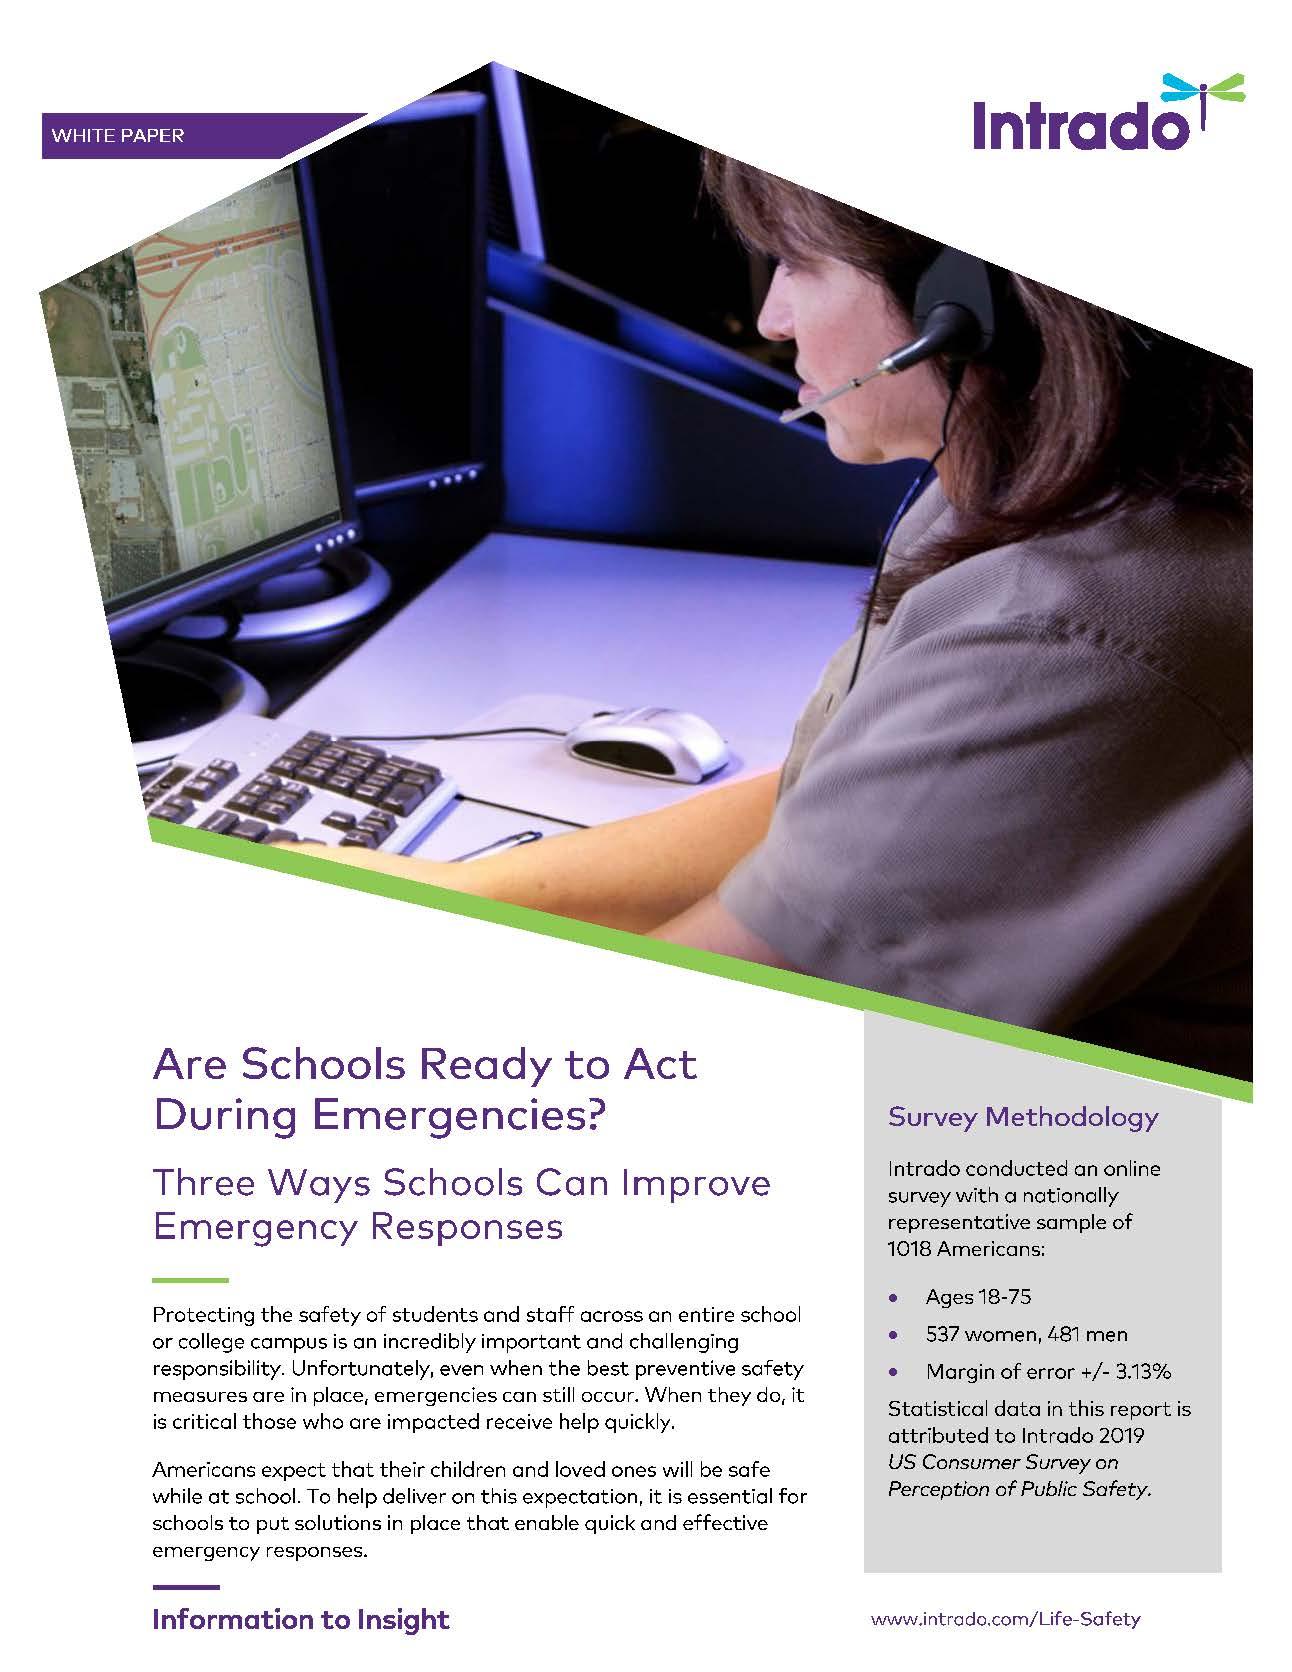 JONESBlog-June22-telecom-marketing-Intrado schools copy (1)